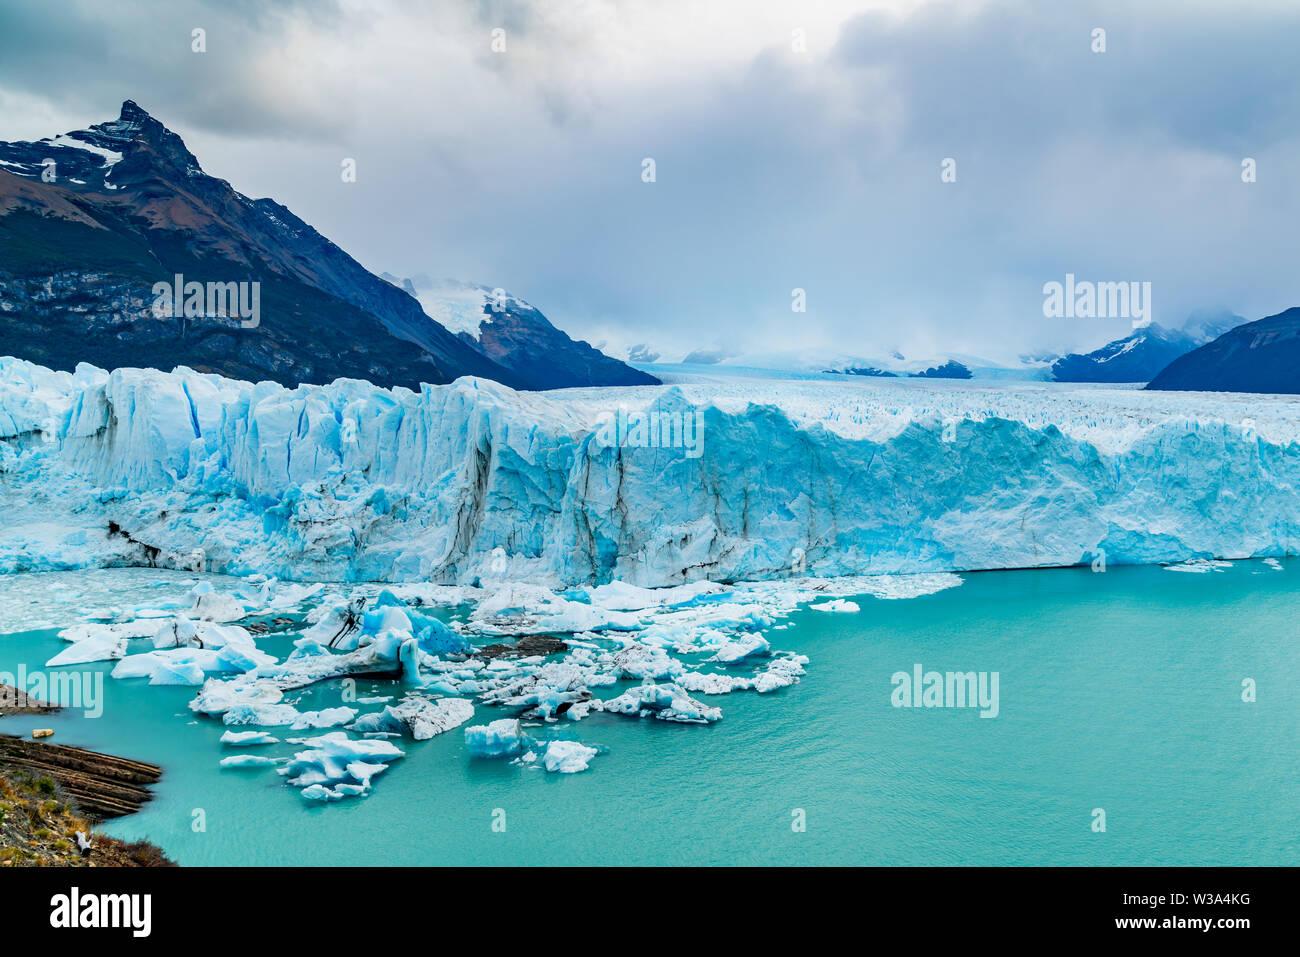 View of Perito Moreno Glacier with Iceberg floating in Argentina lake in Los Glaciares National Park Argentina Patagonia - Stock Image